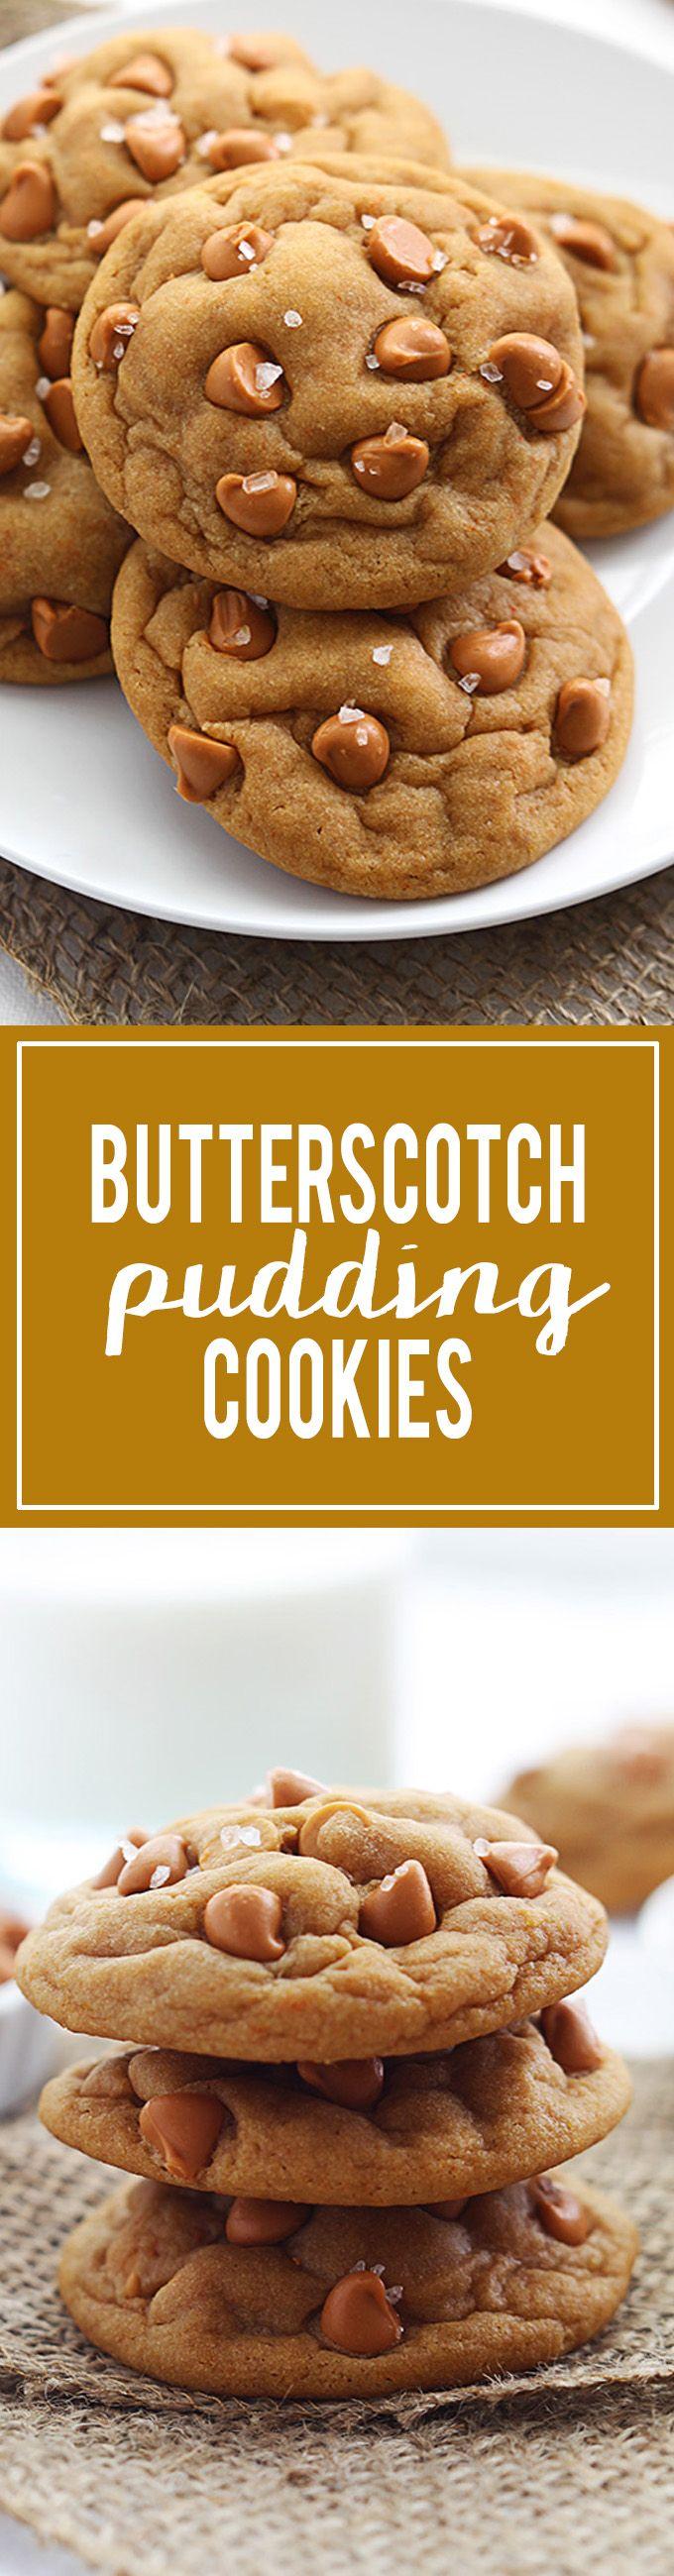 Butterscotch Pudding Cookies | Creme de la Crumb